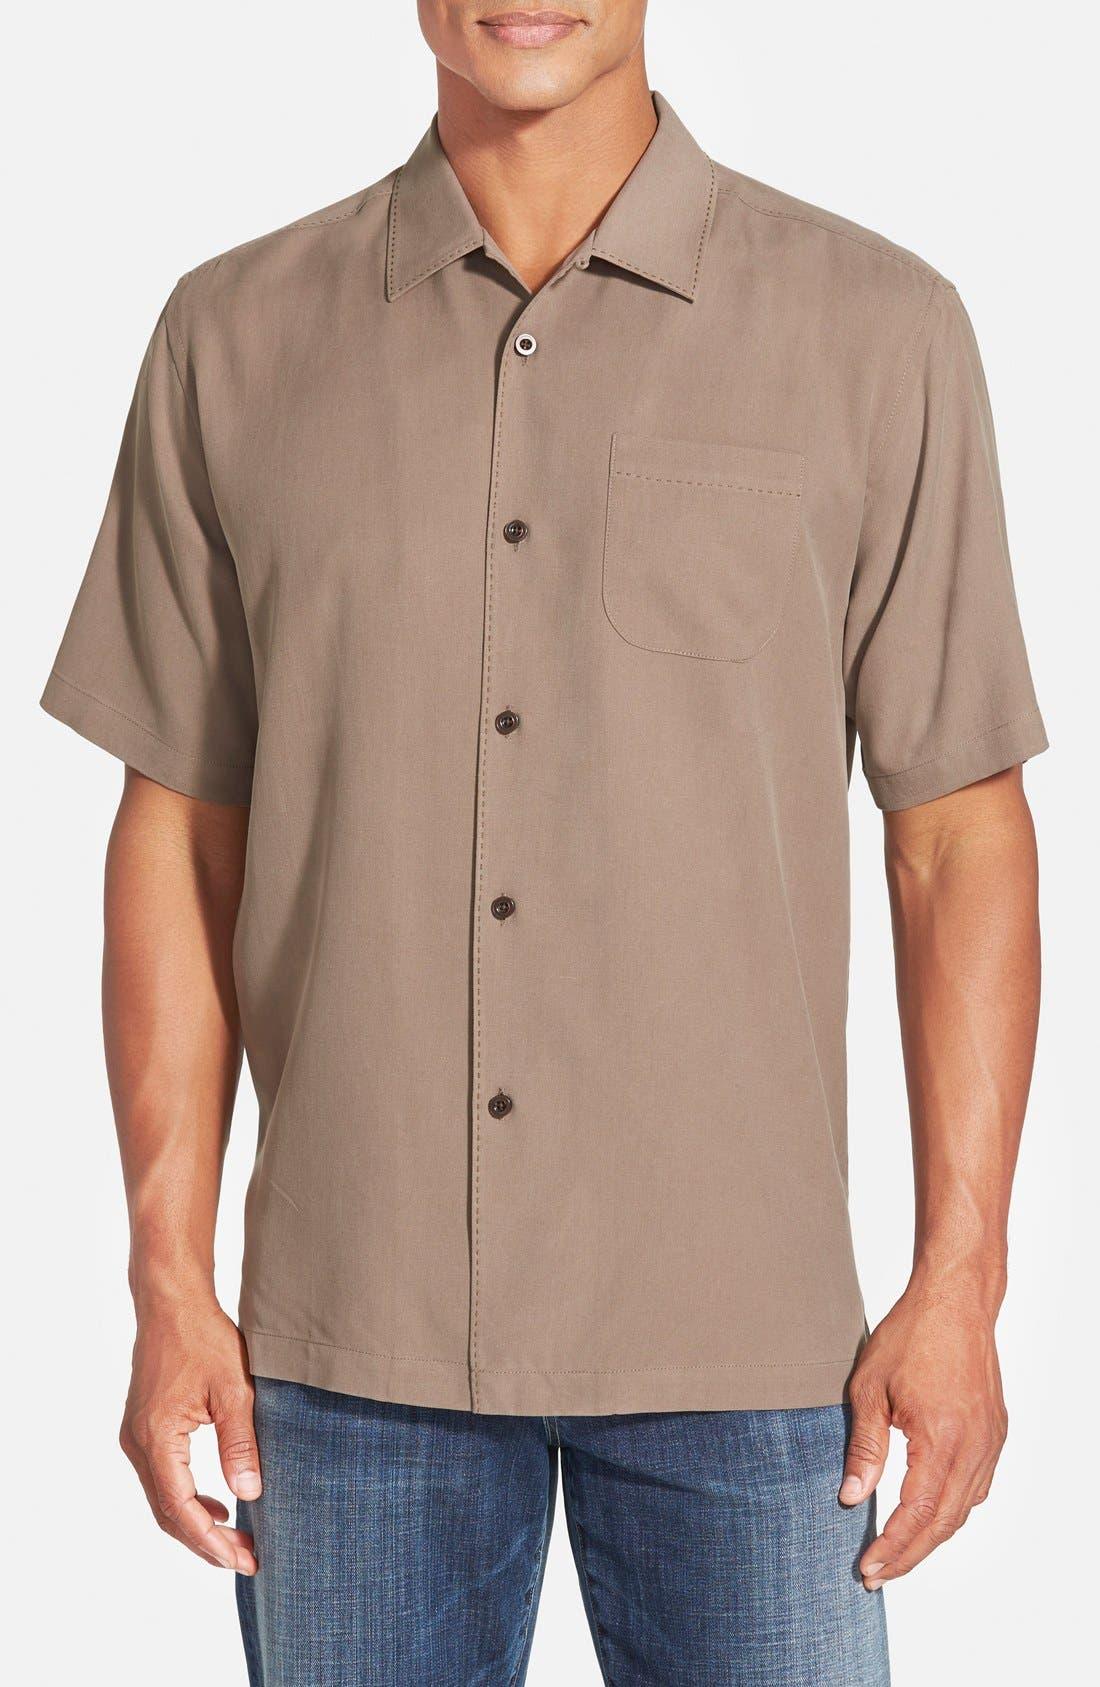 Main Image - Tommy Bahama 'Catalina Twill' Original Fit Silk Camp Shirt